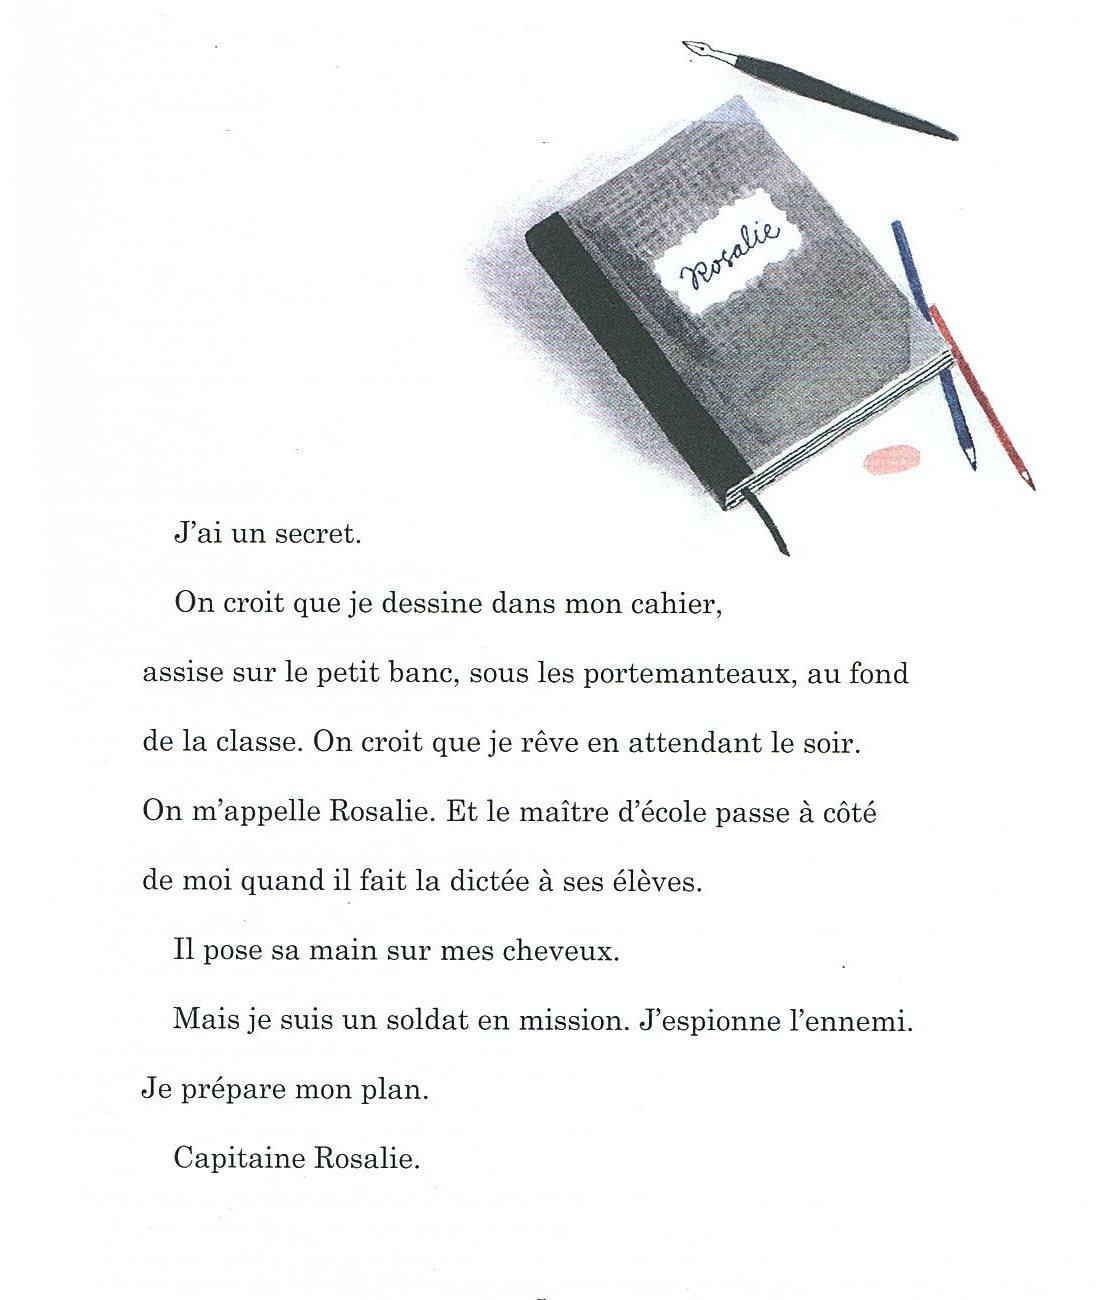 incipit_capitainerosalie1b